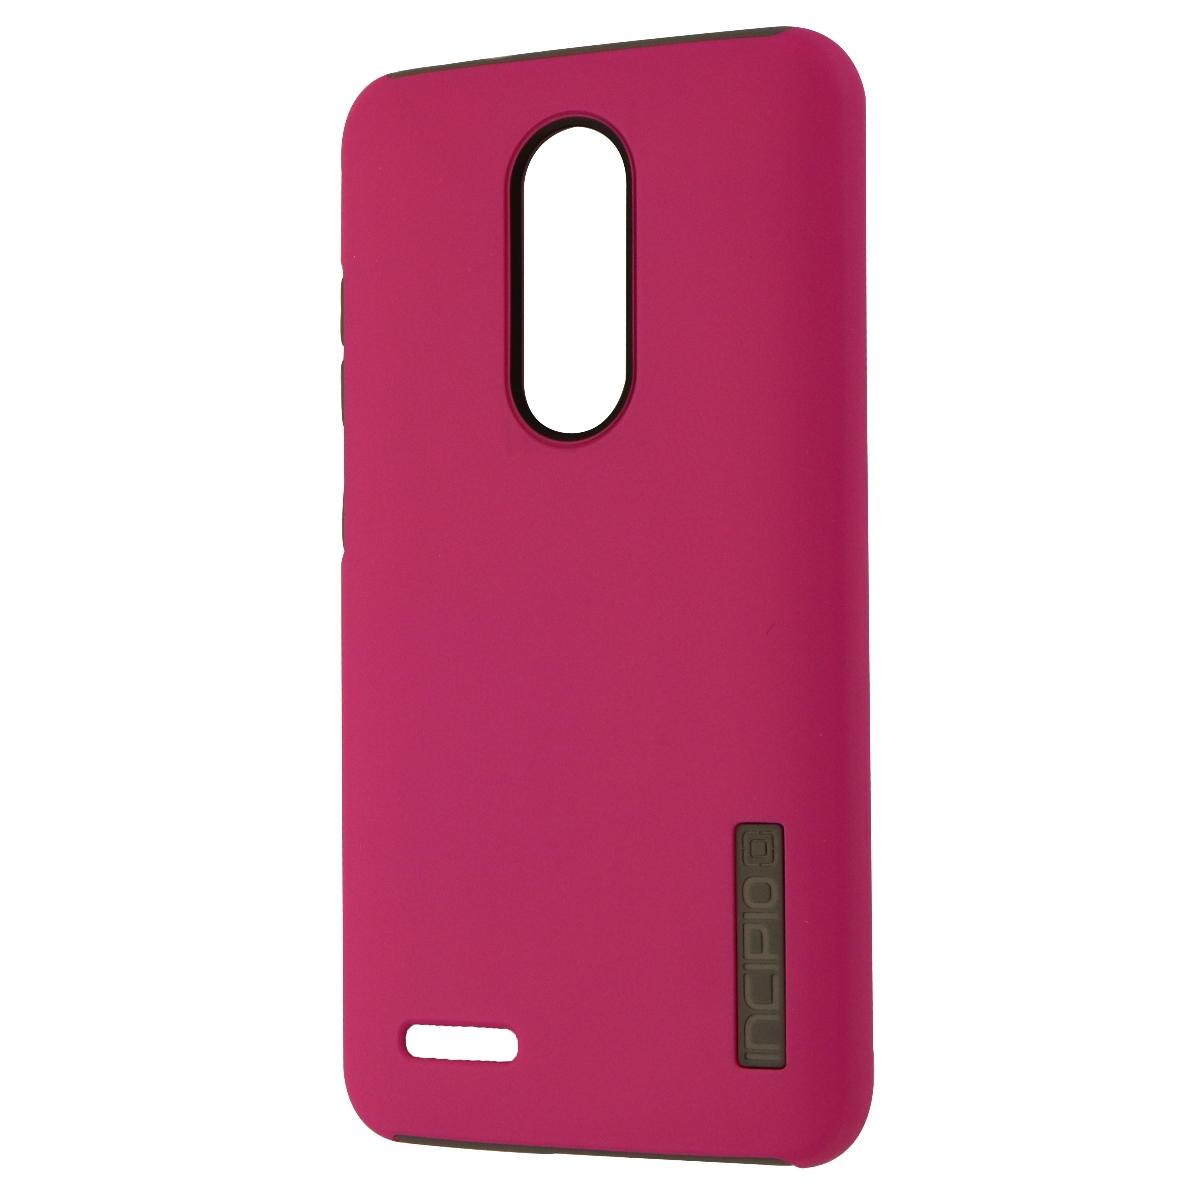 Incipio DualPro Series Dual Layer Case Cover for ZTE ZMAX Pro - Matte Pink/Gray